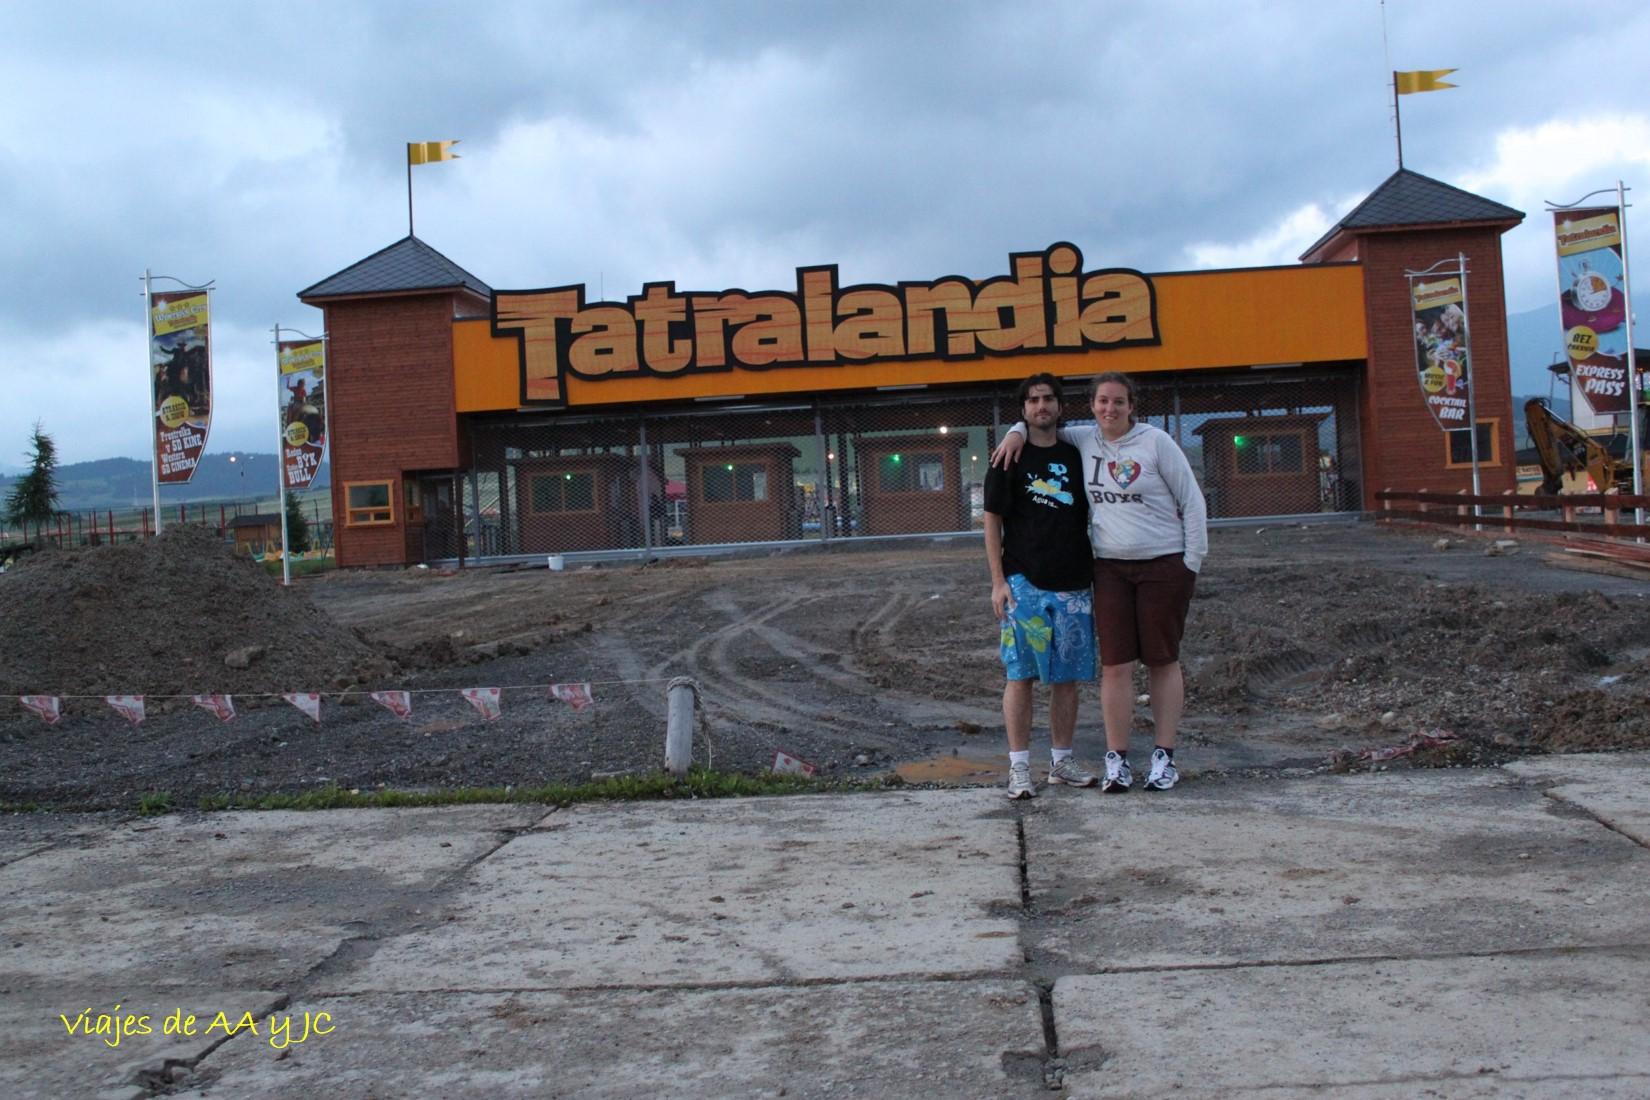 esl6-tatralandia